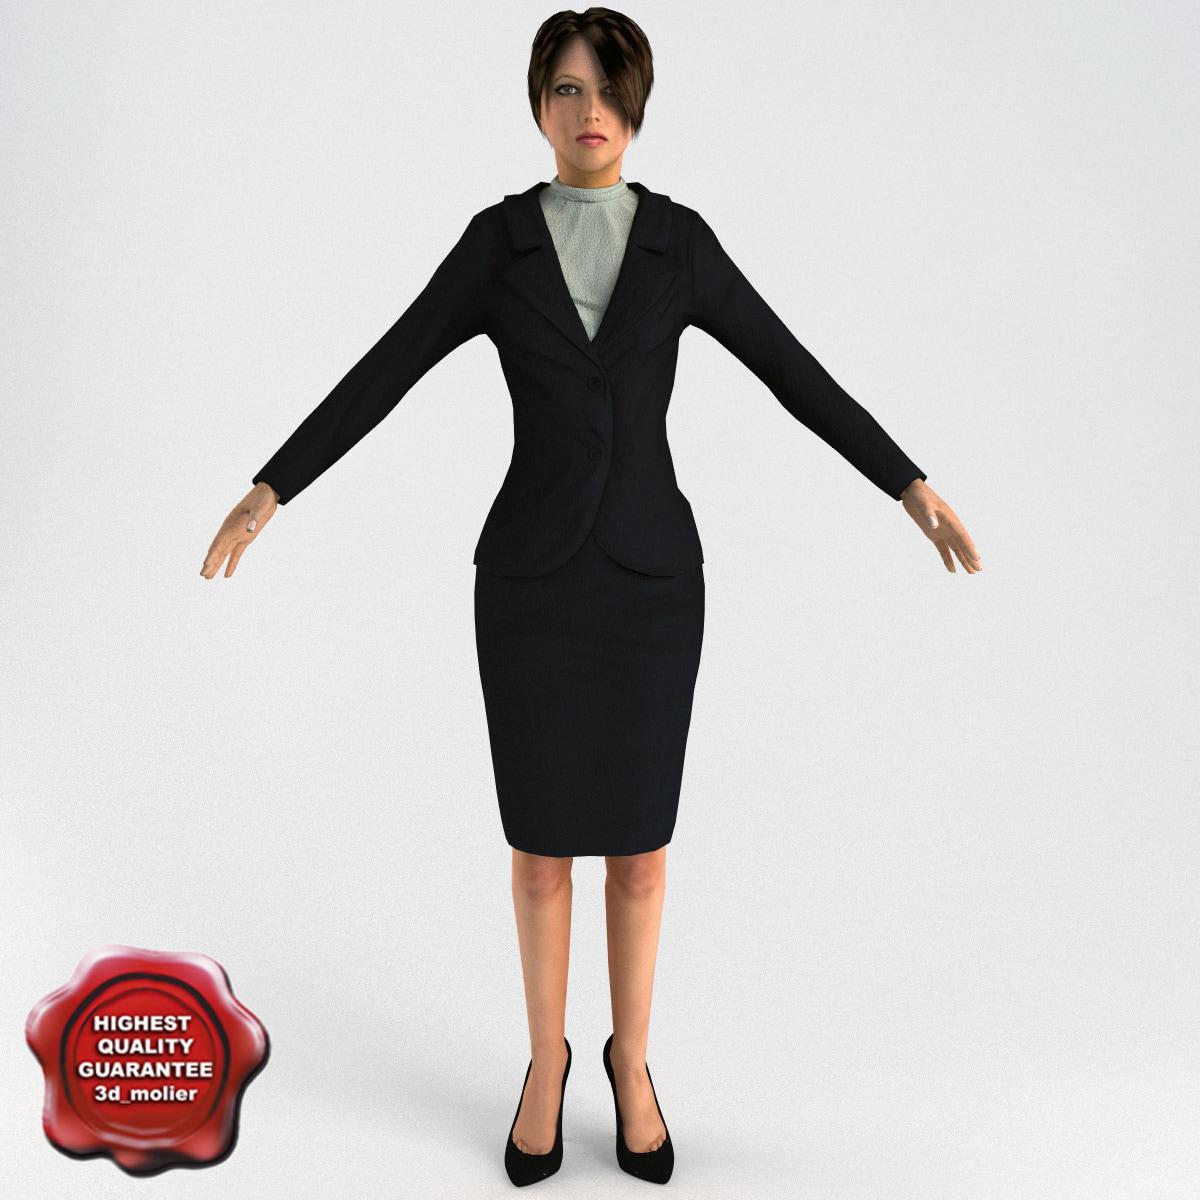 Business_Woman_00.jpg